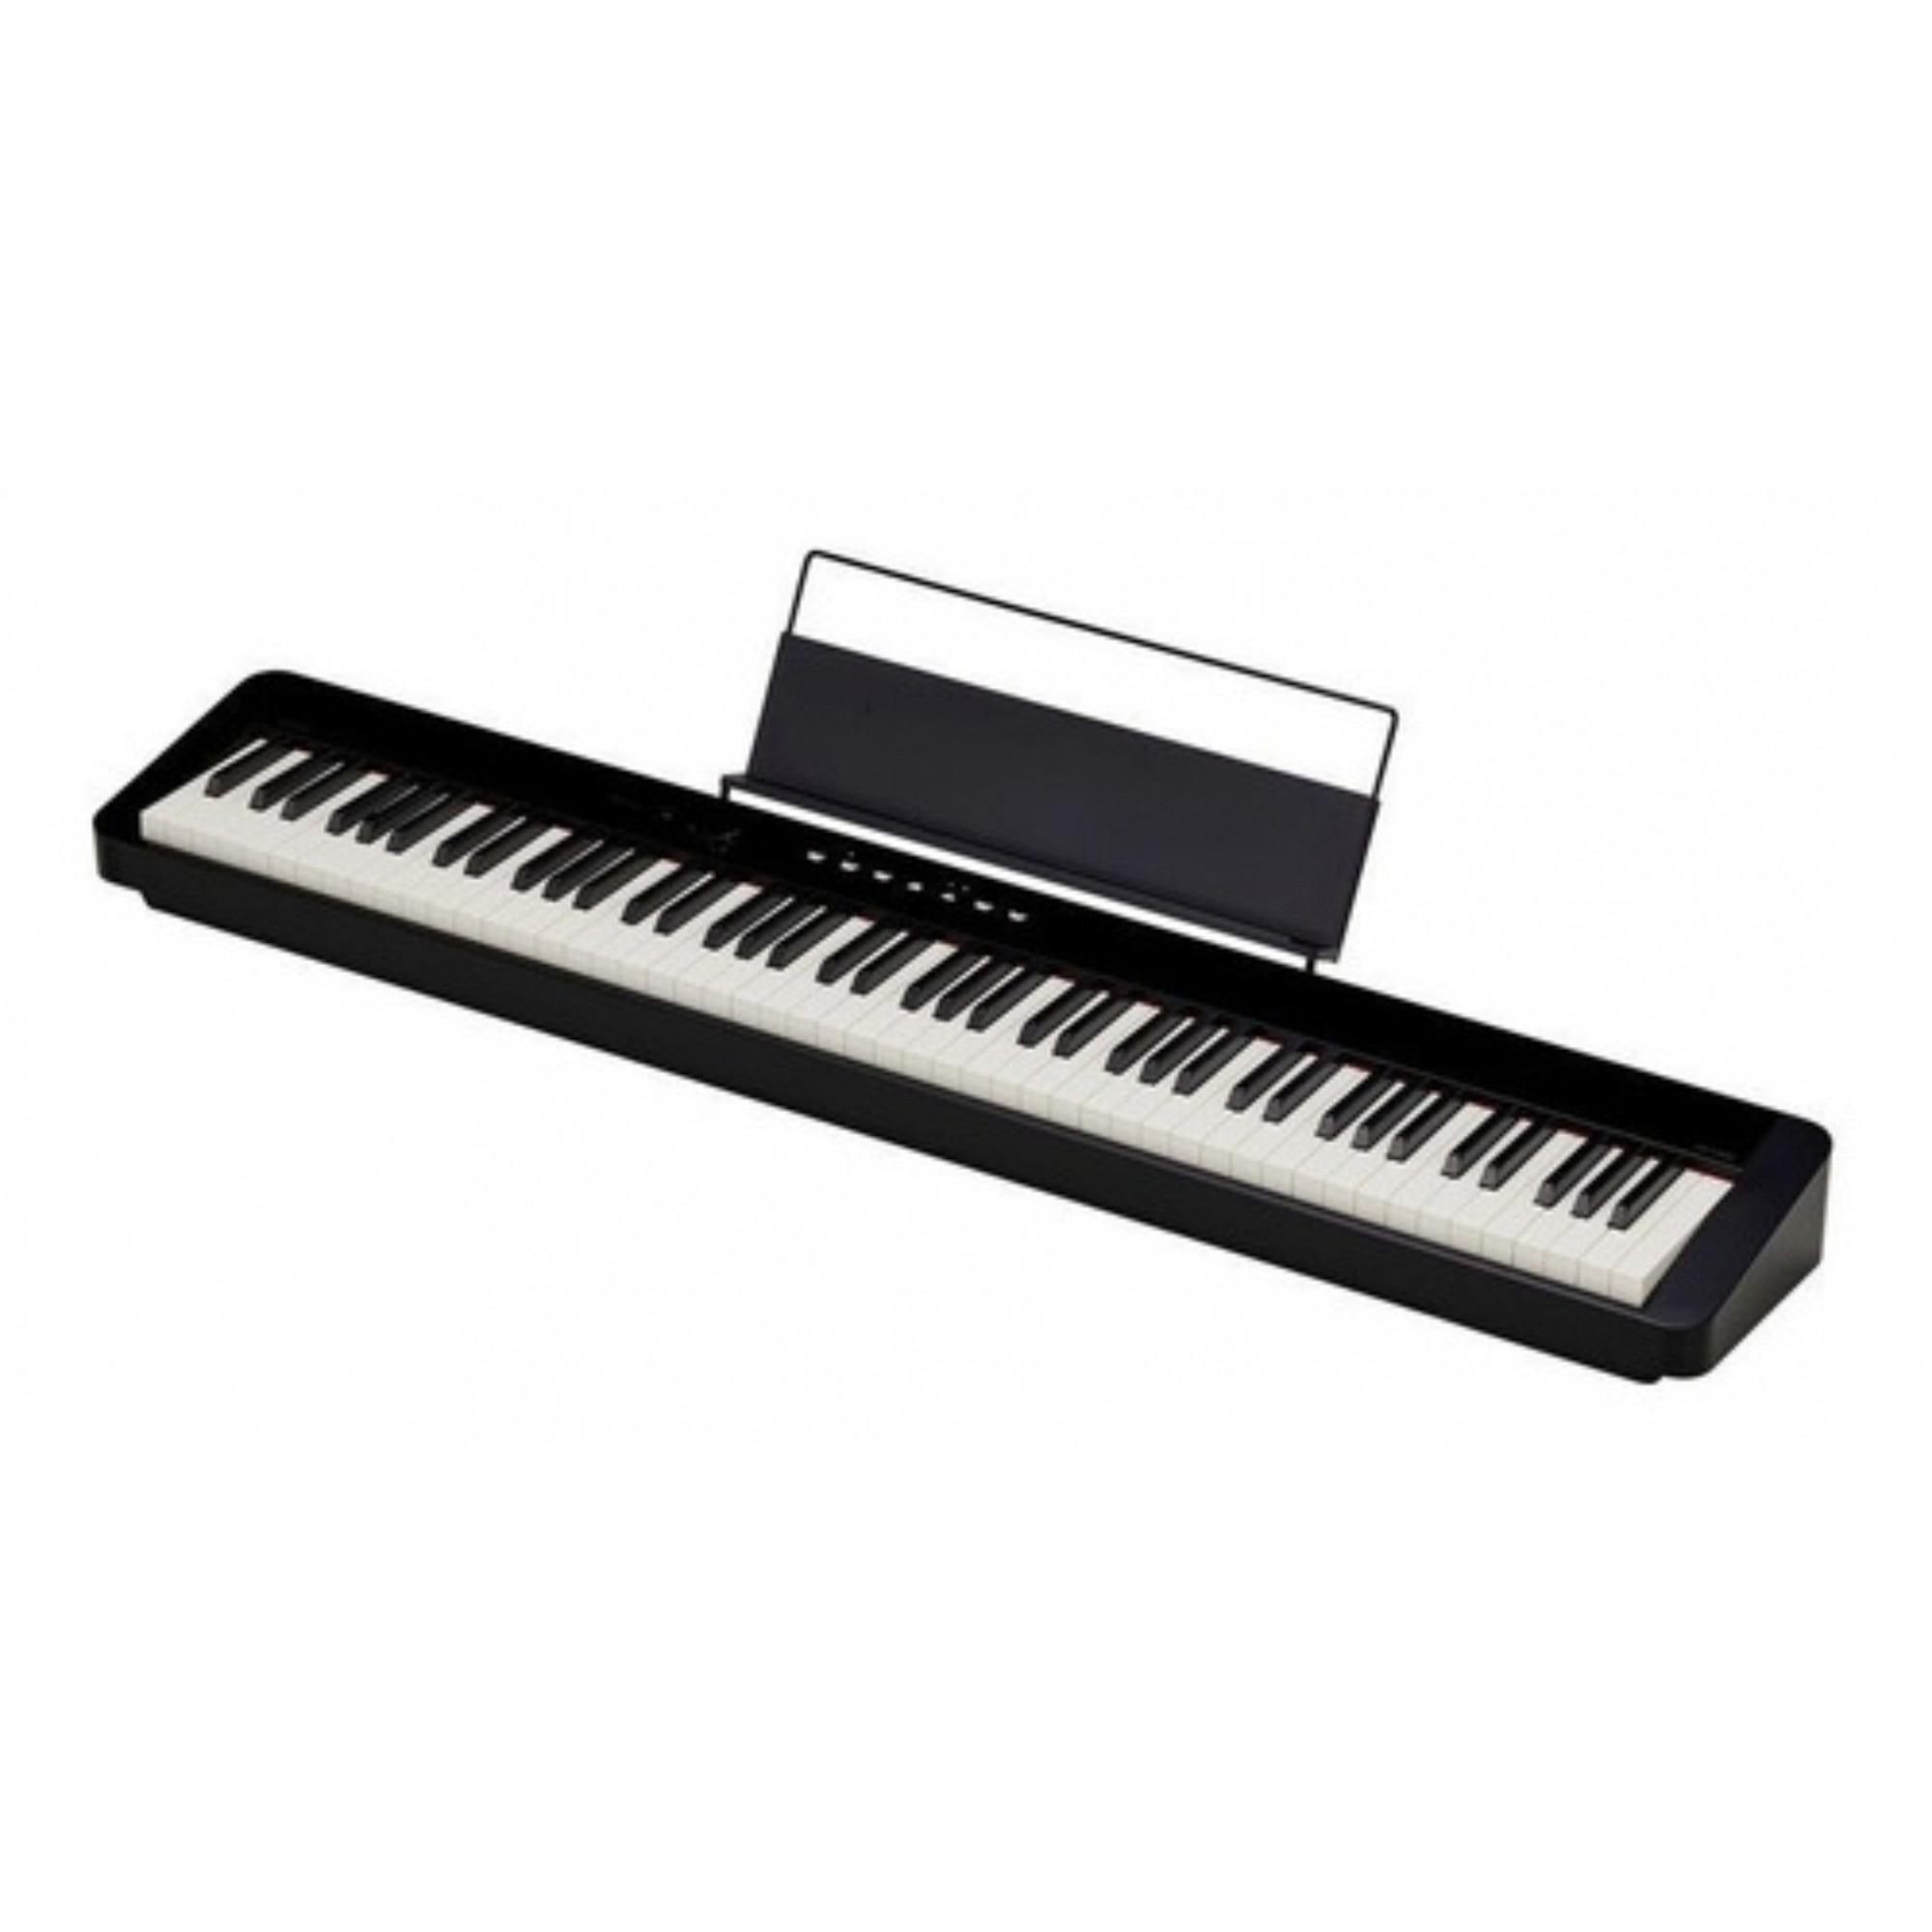 Piano Digital Casio Privia Px S 1000 Bk /ESTANTE VENDIDA SEPARADAMENTE